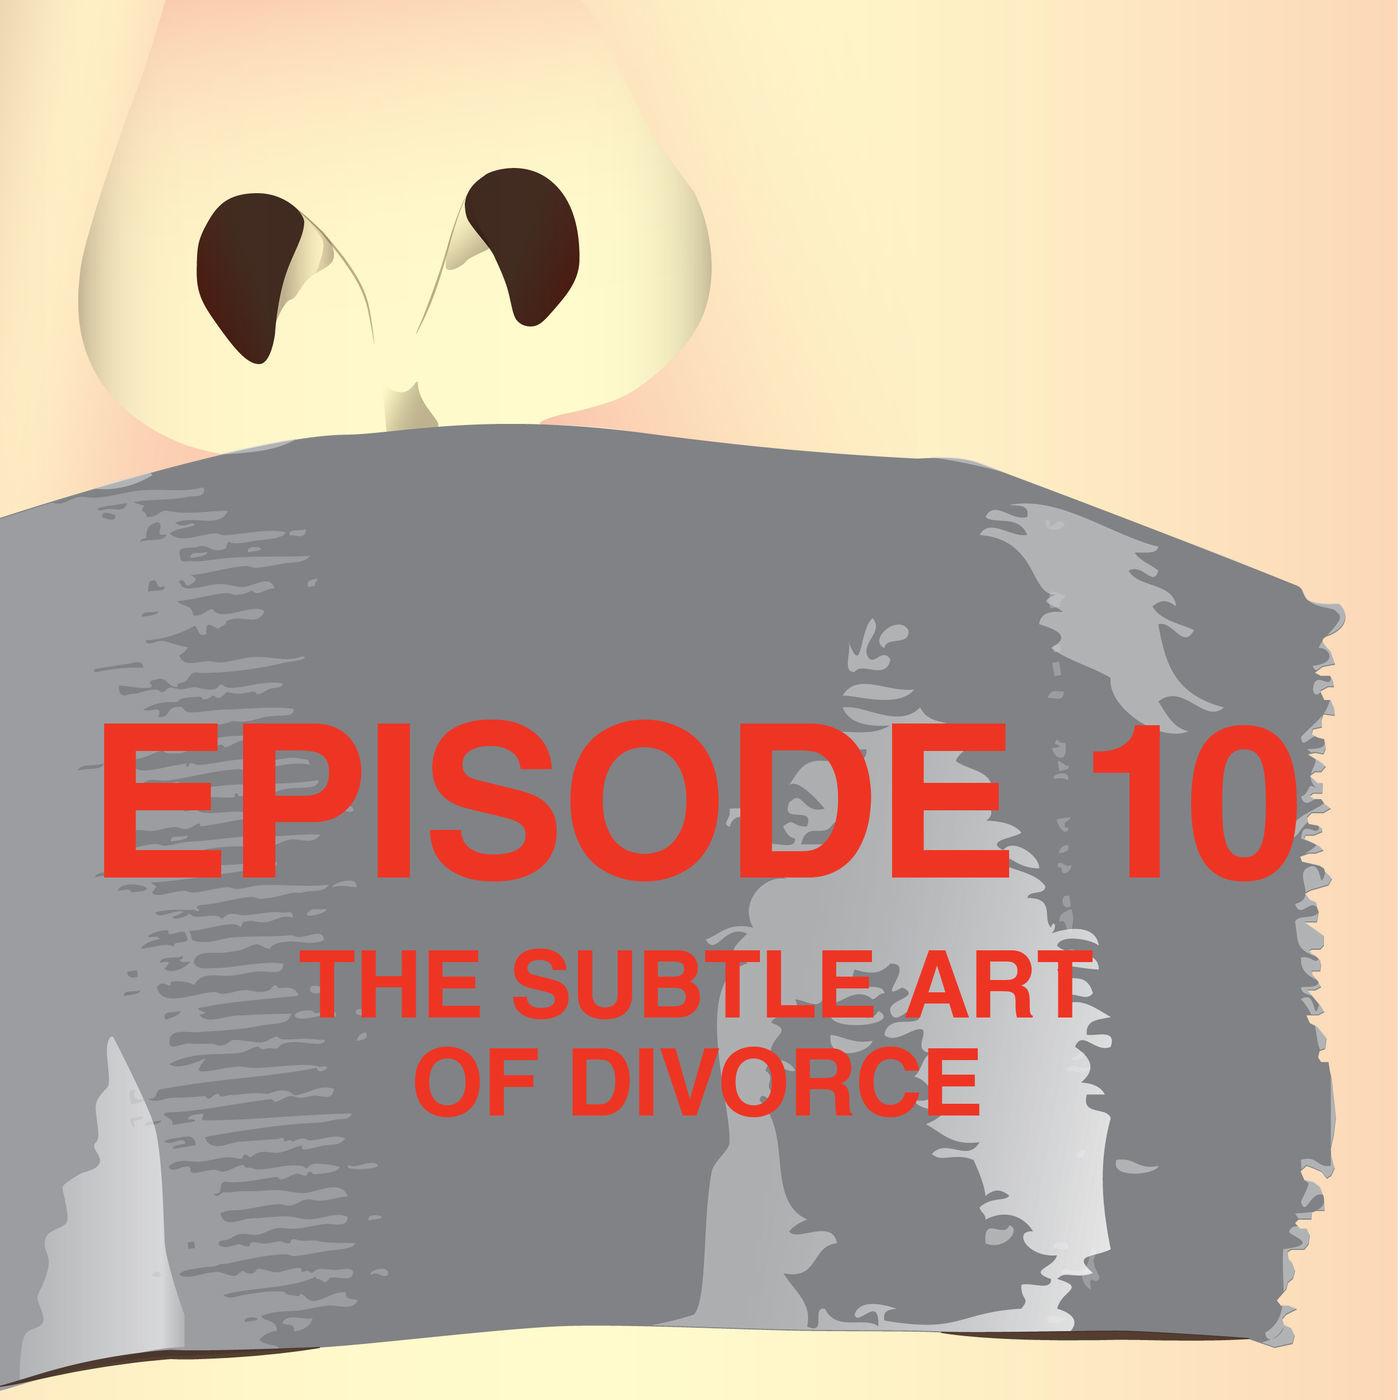 The Subtle Art of Divorce